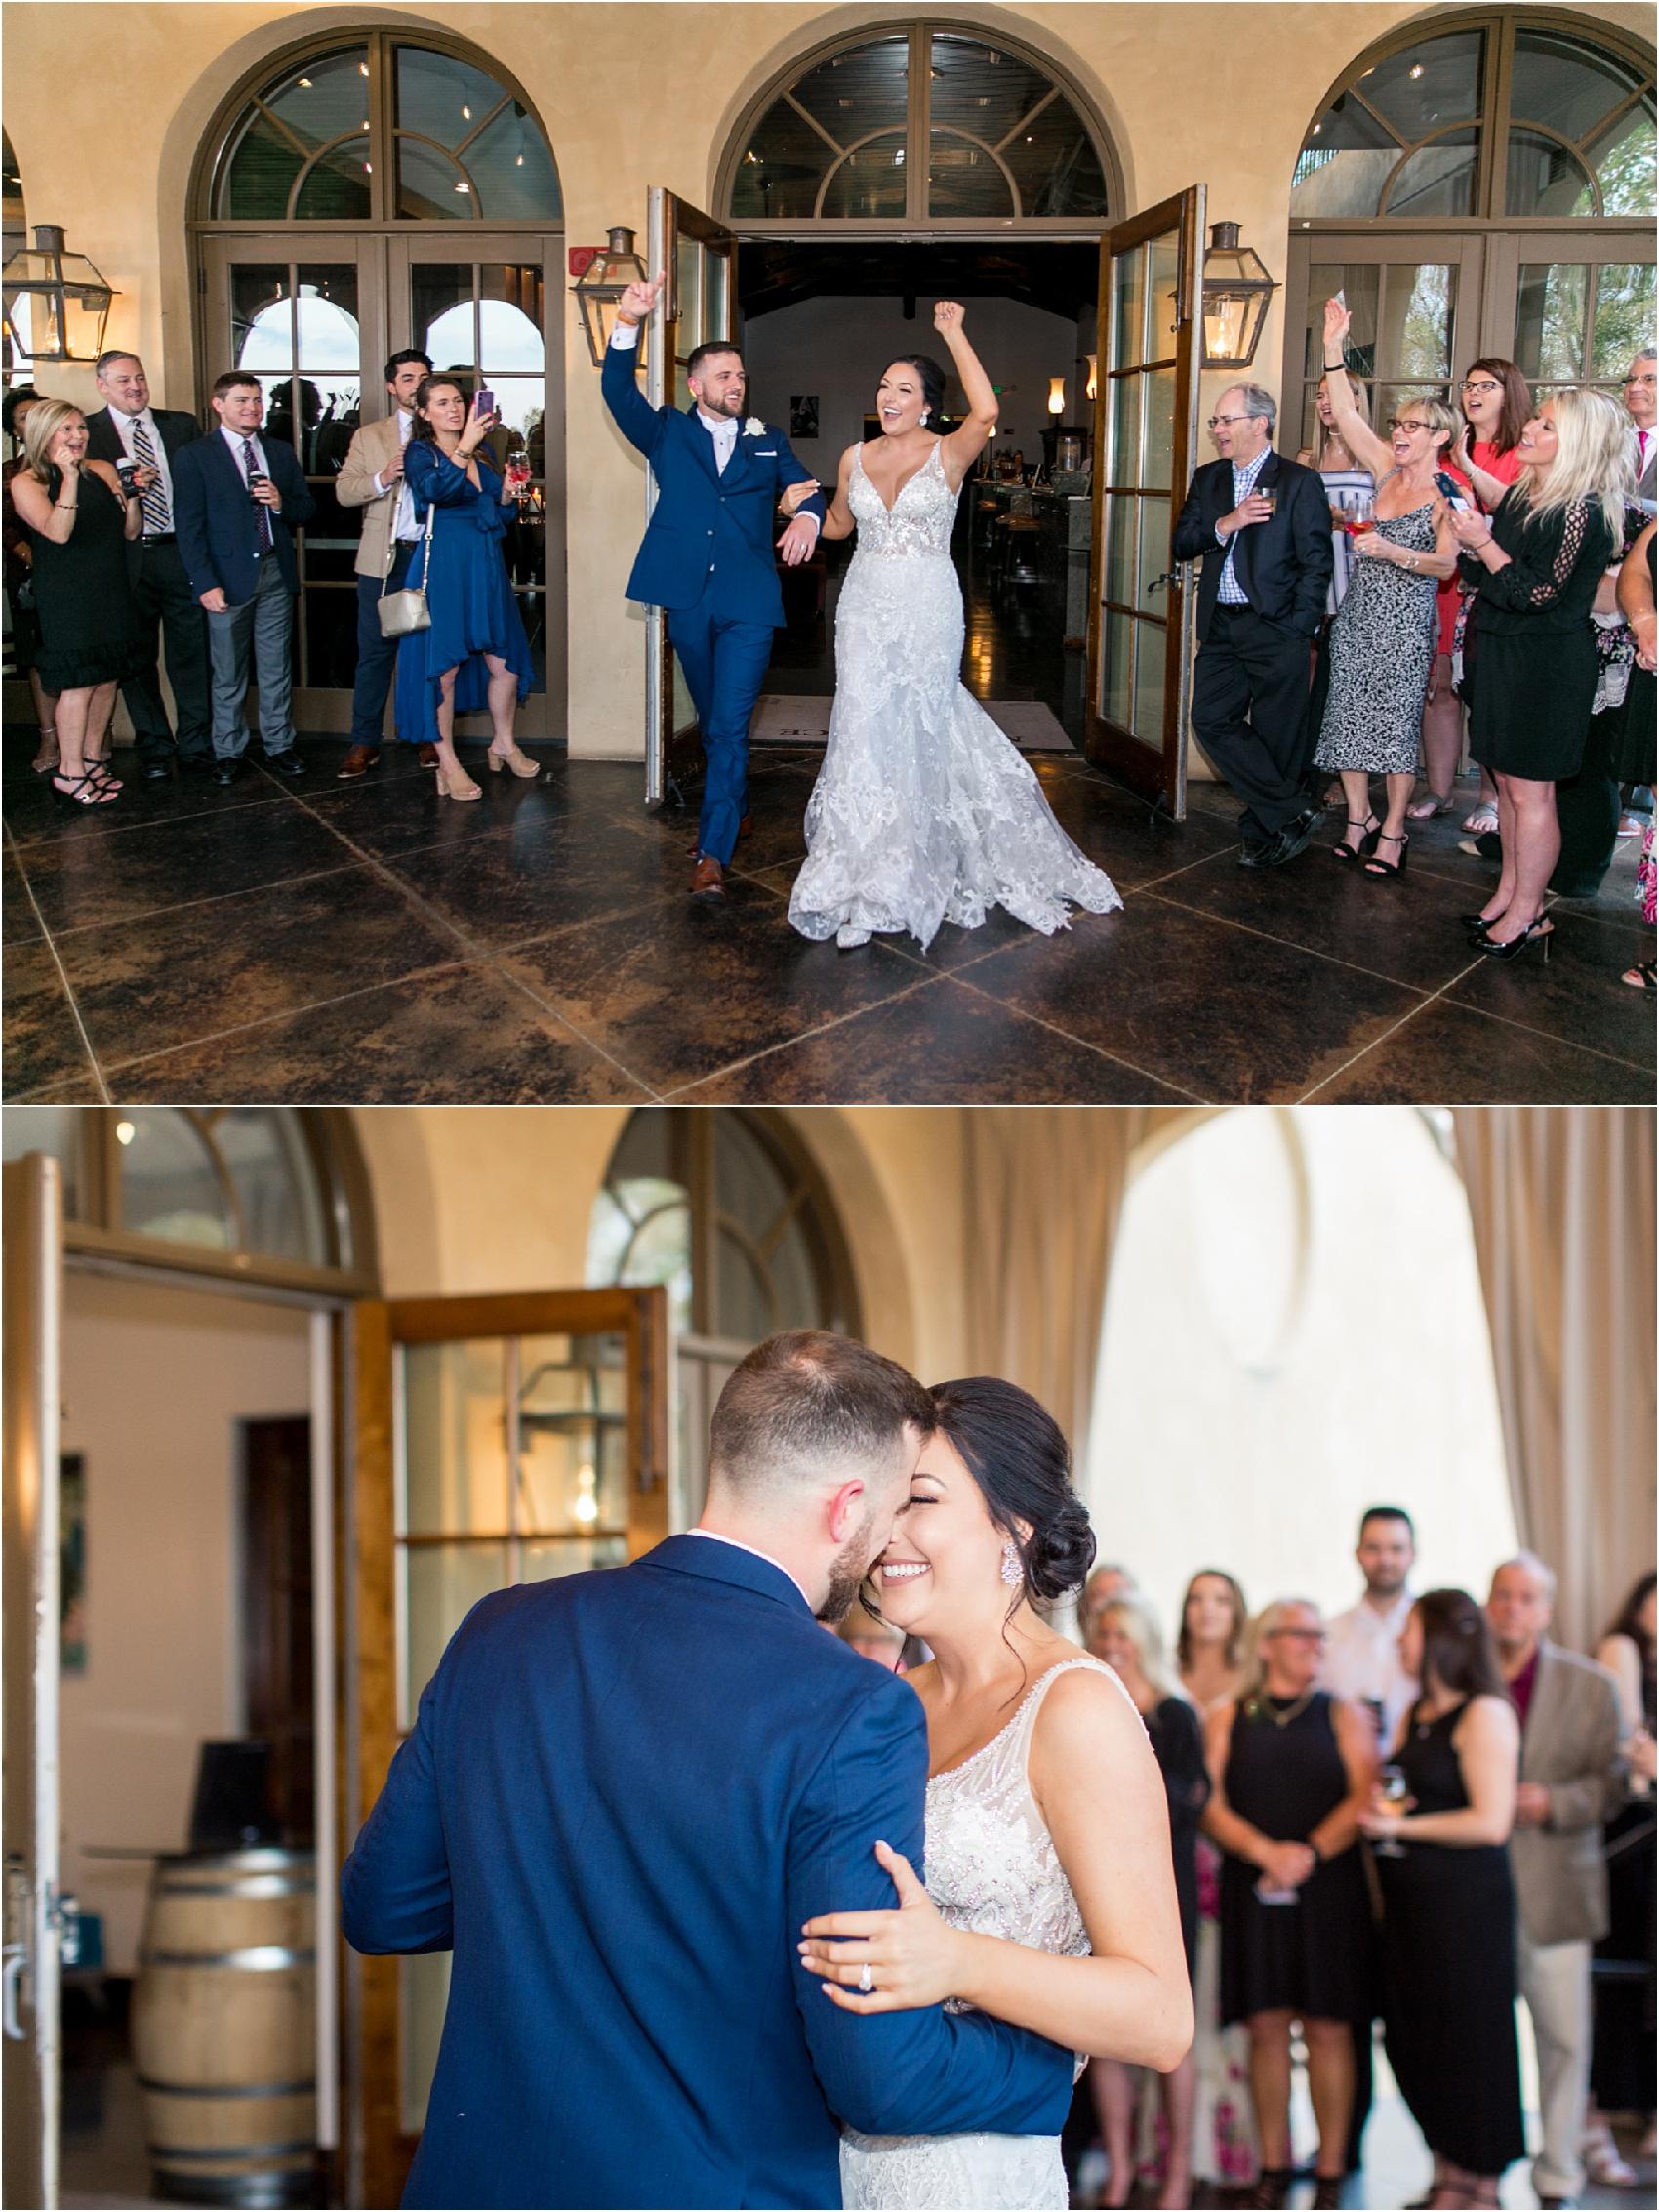 Savannah Eve Photography- Turnbill-Gilgan Wedding- Blog-69.jpg